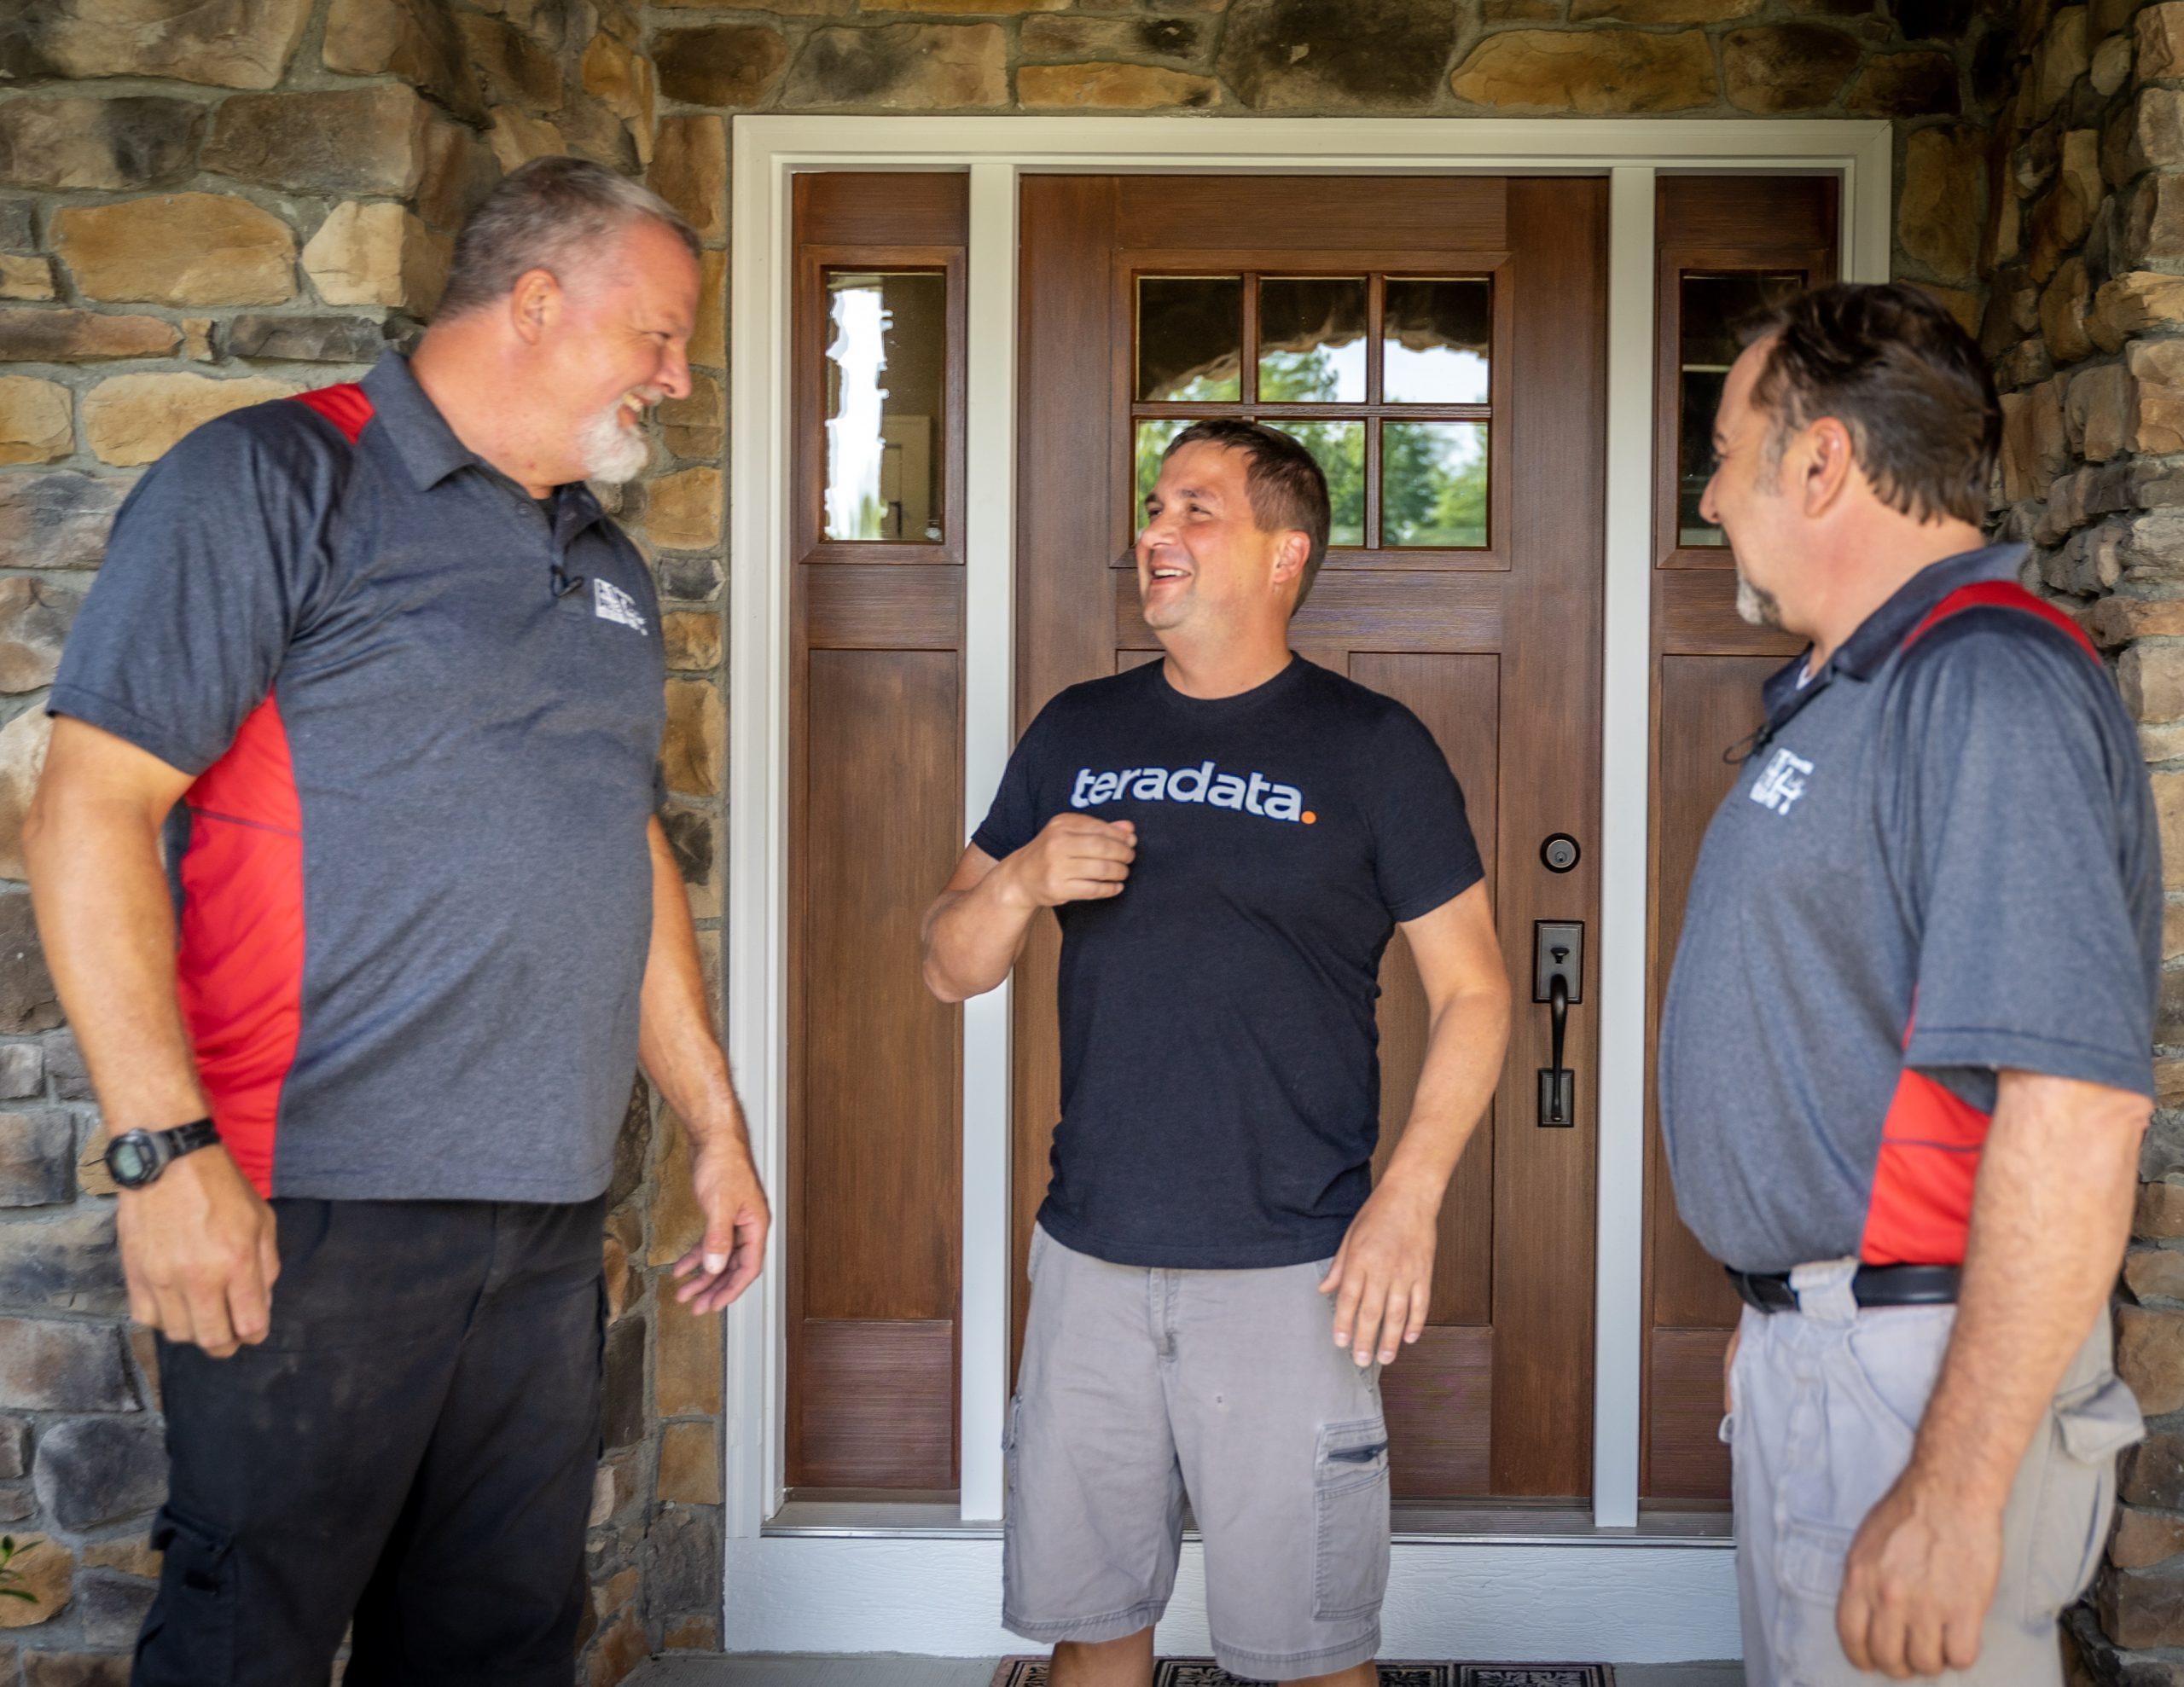 service technicians discuss pest control and elimination